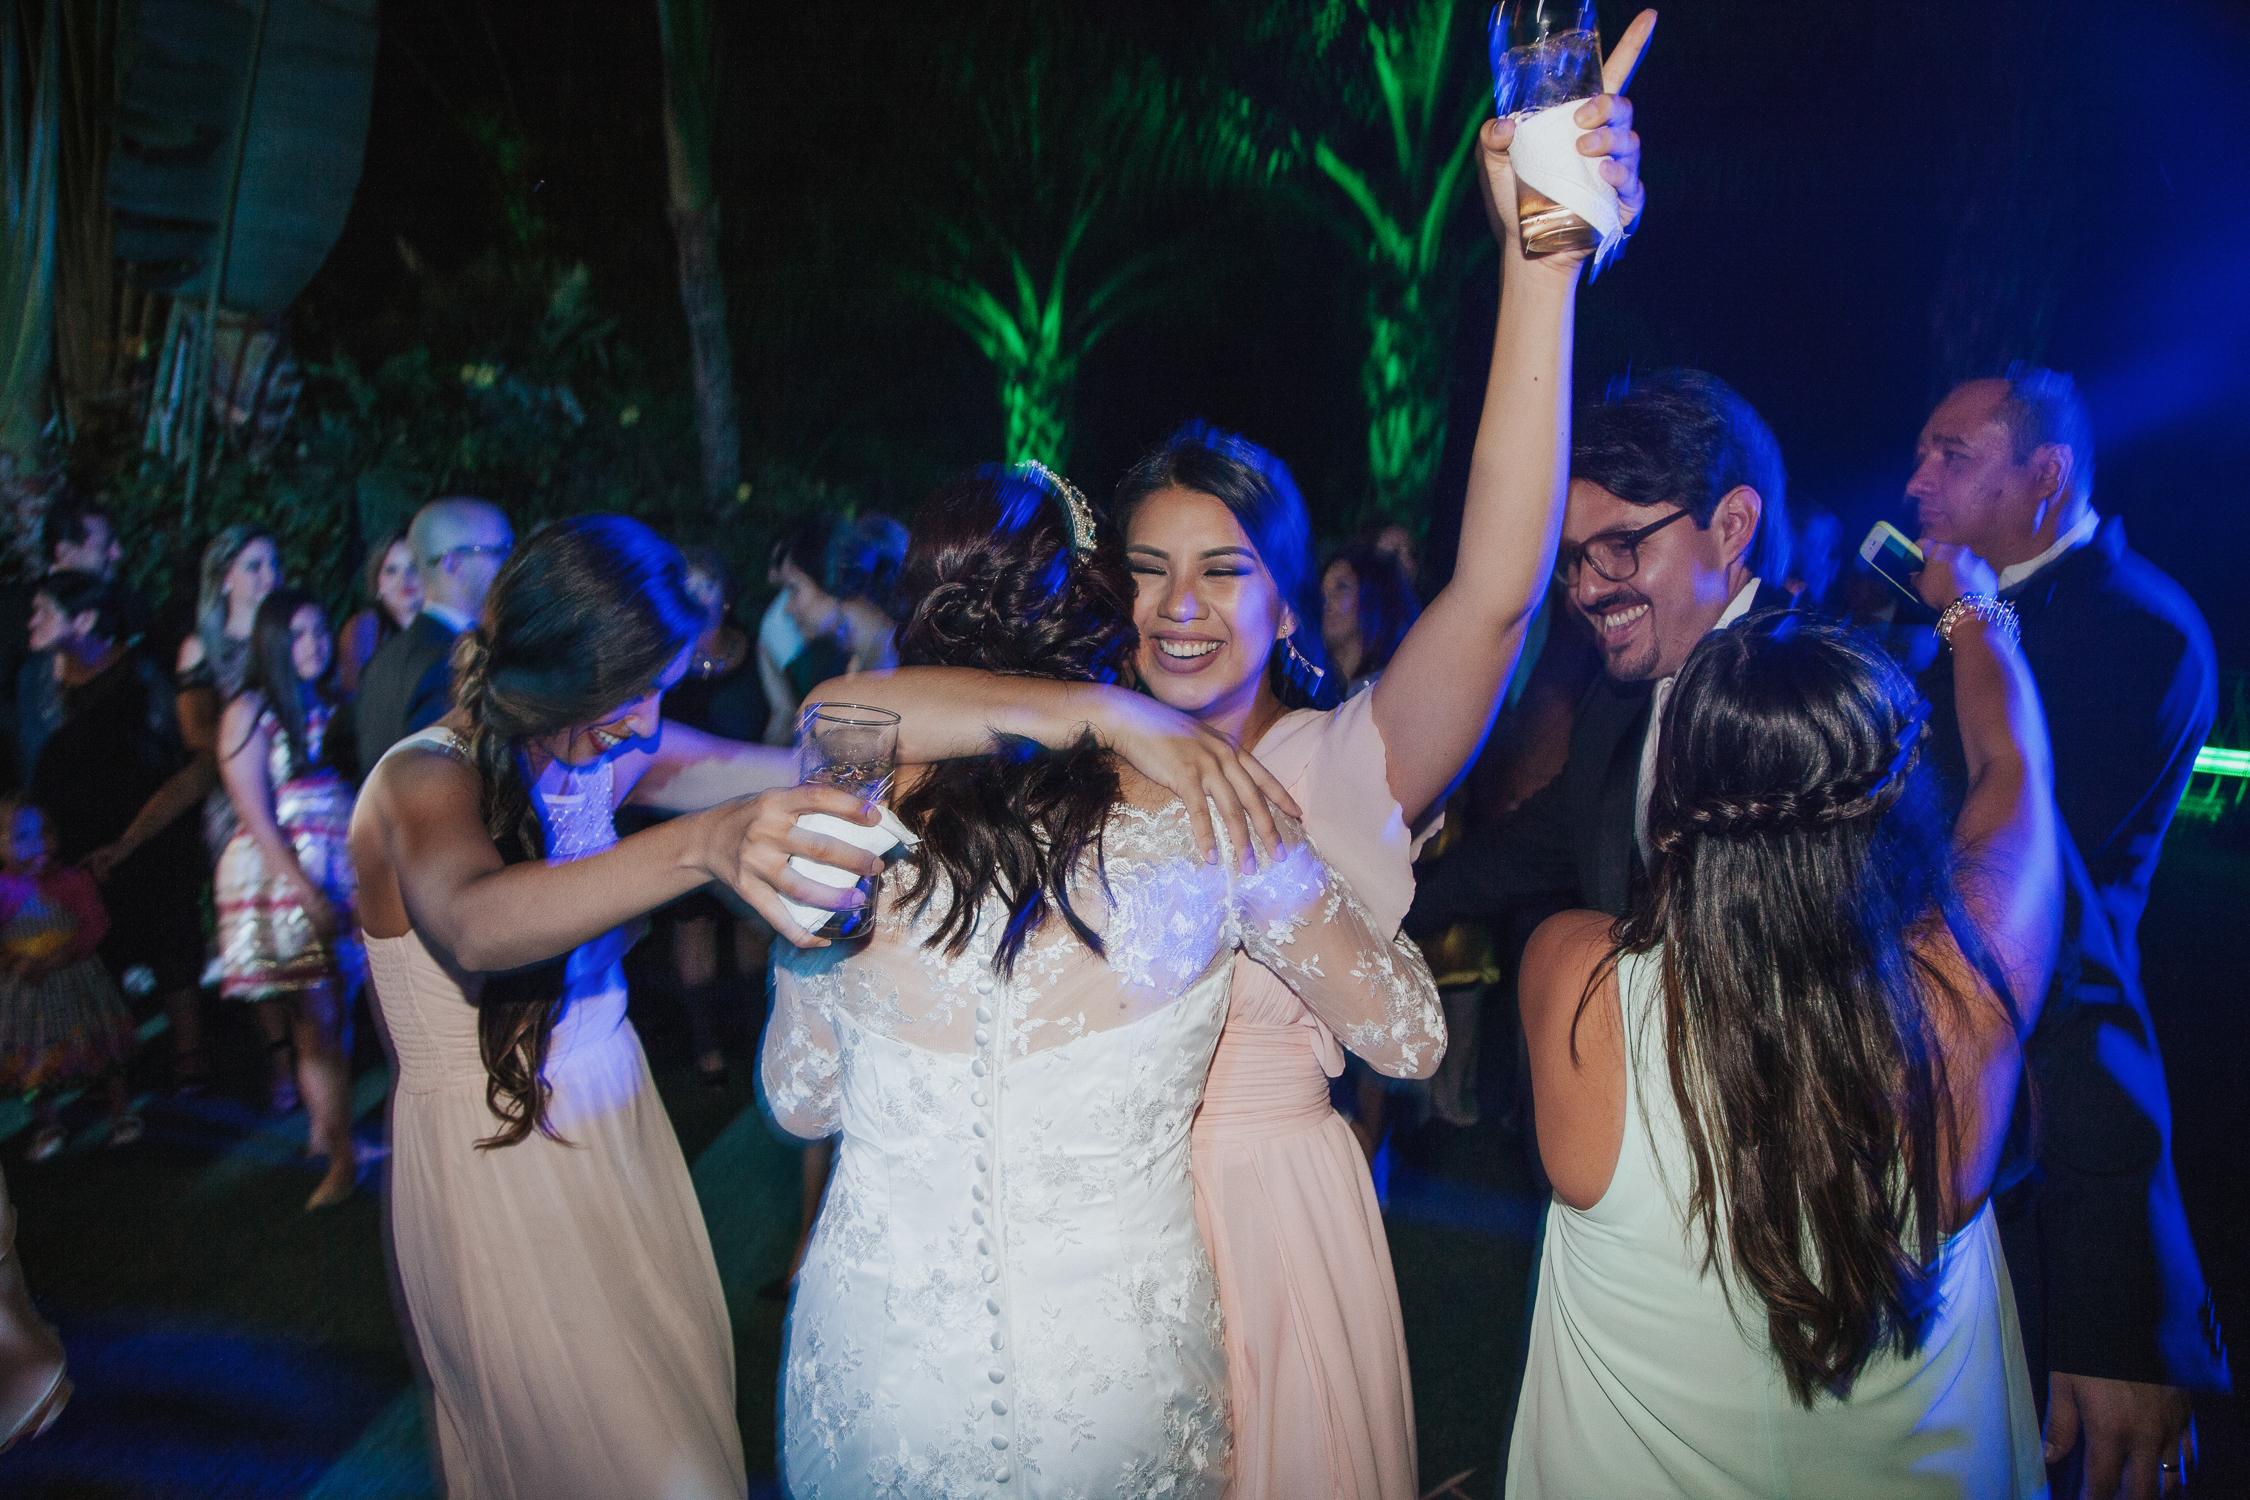 Michelle-Agurto-Fotografia-Bodas-Ecuador-Destination-Wedding-Photographer-Pauli-Edwin-33.JPG